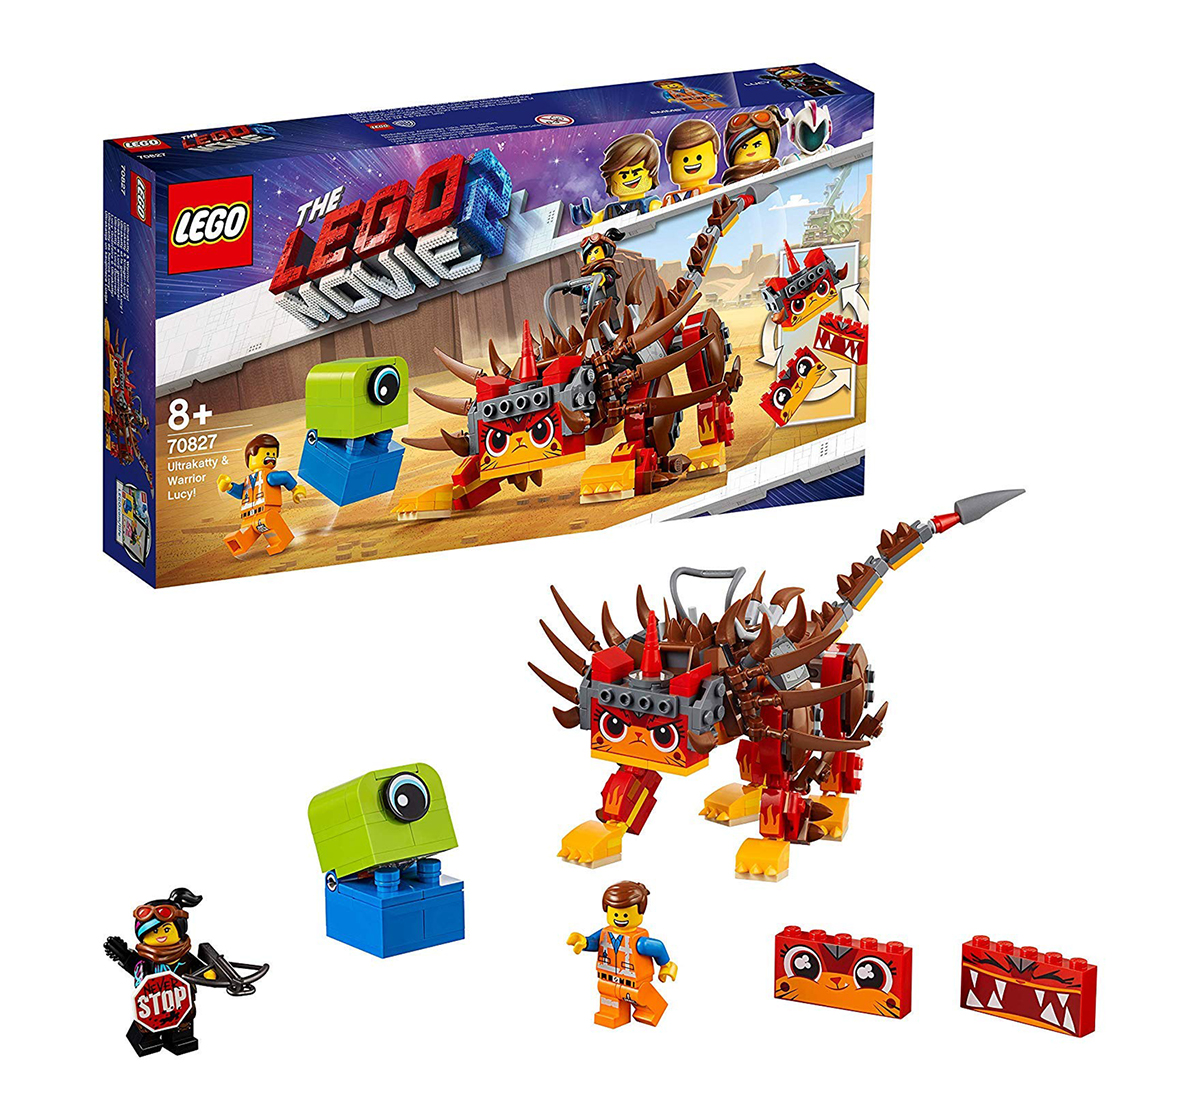 LEGO | Lego The Movie 2 Ultrakatty & Warrior Lucy (383 Pcs) 70827  Blocks for Kids age 8Y+